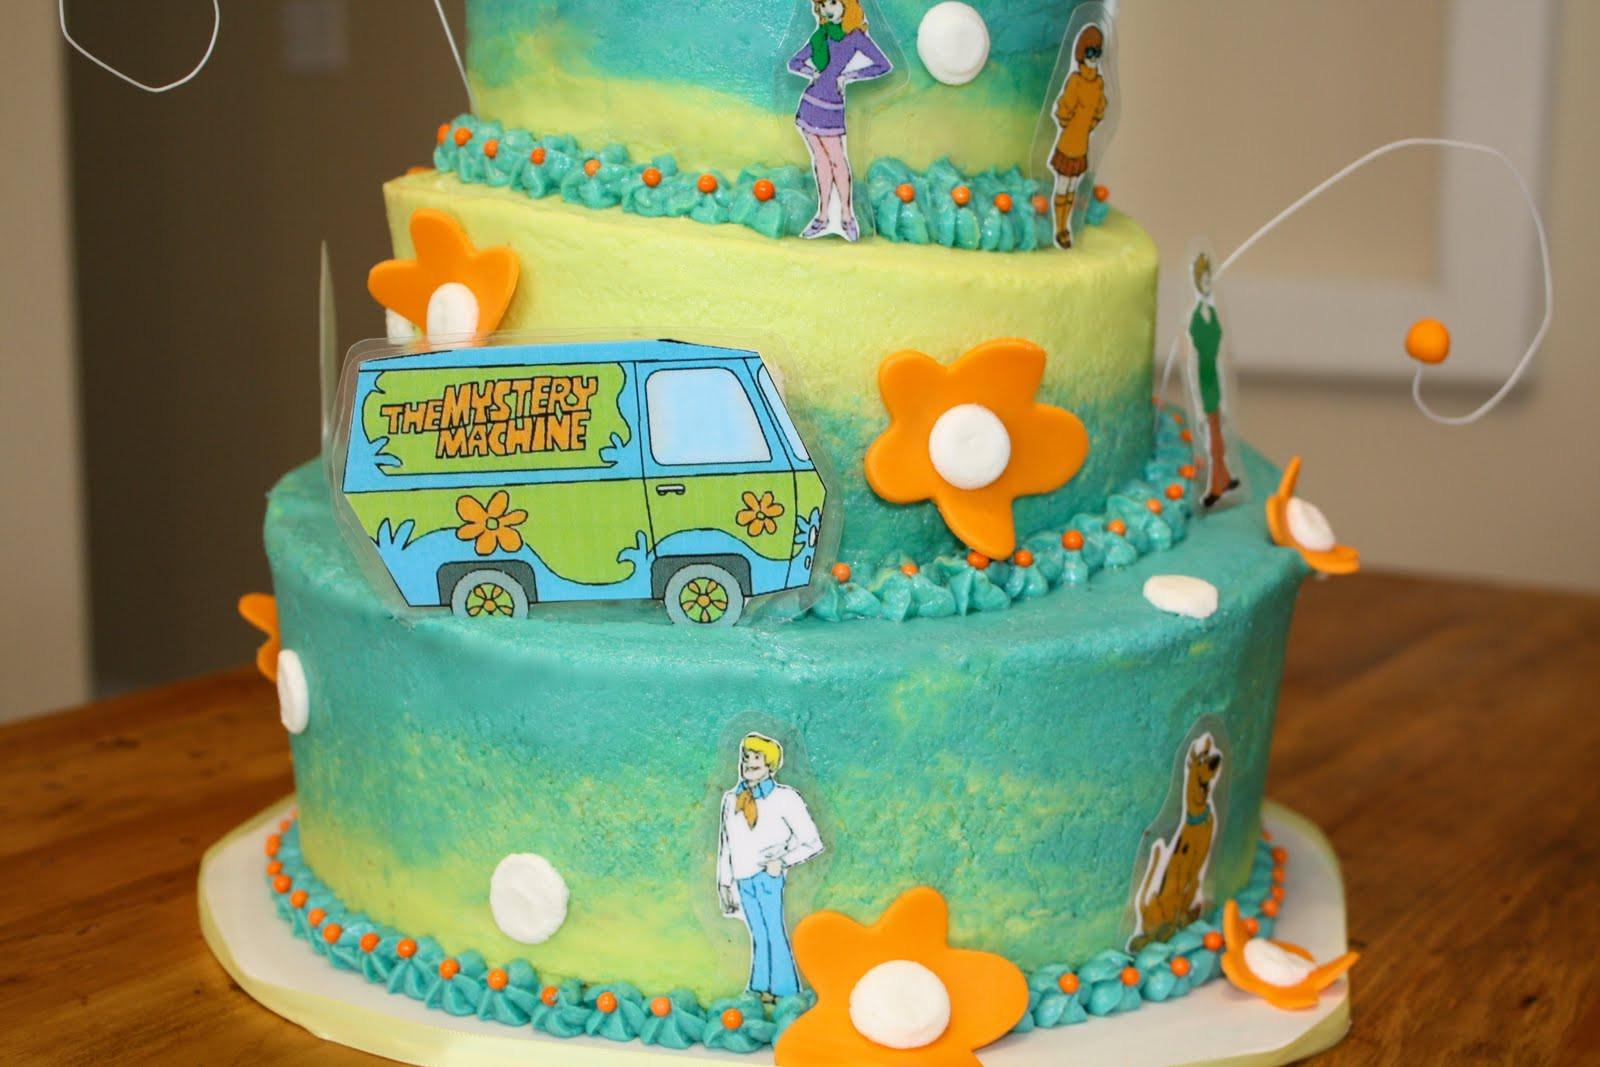 Scooby Doo Birthday Cakes  bumble cakes scooby doo cake